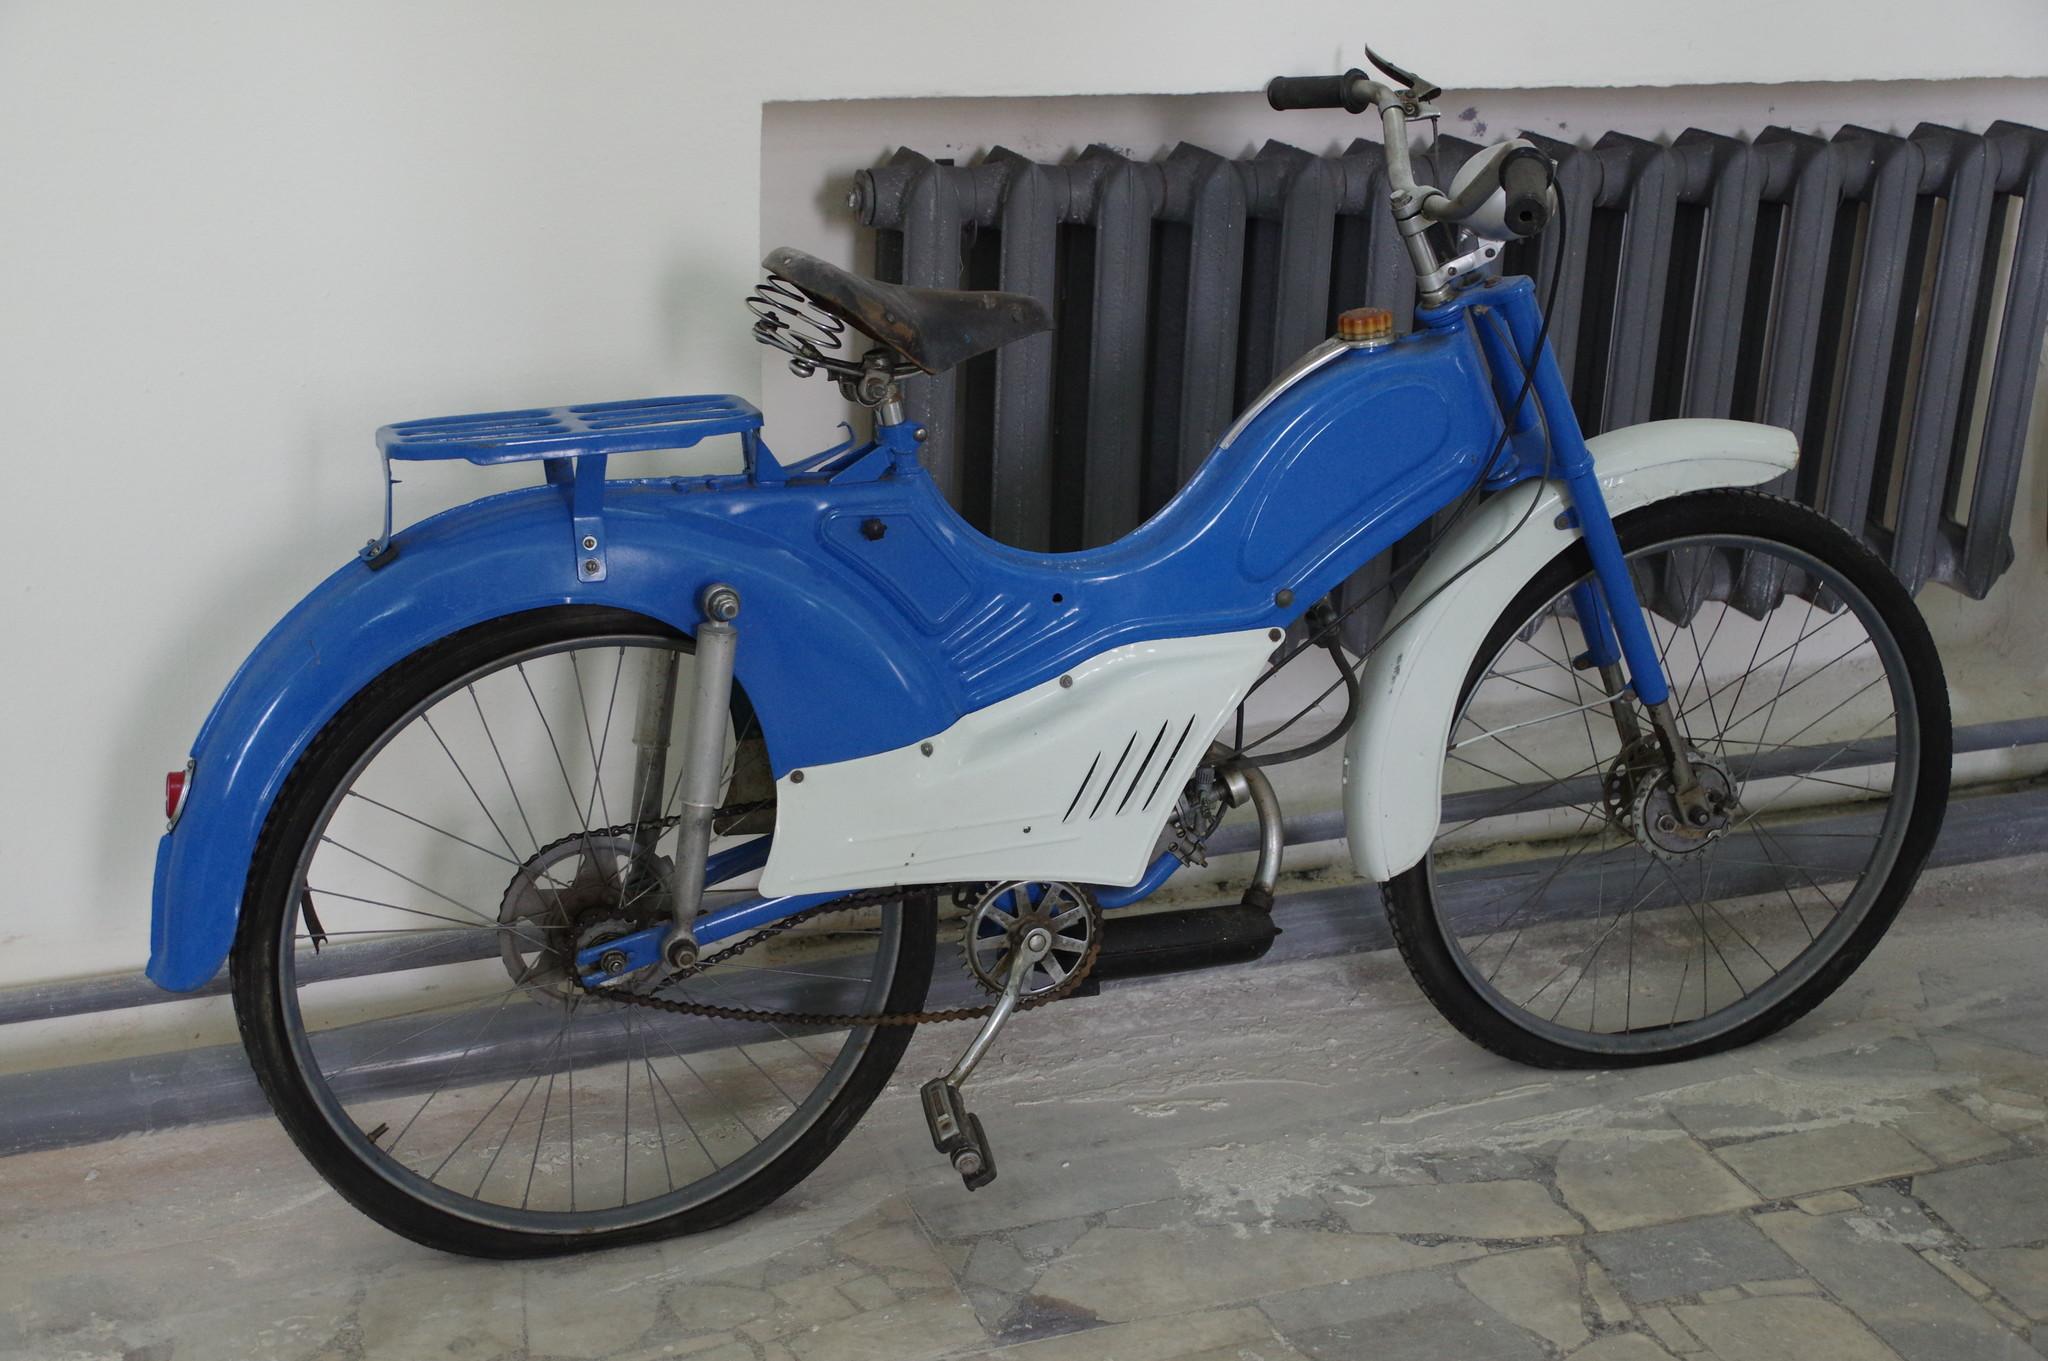 Мопед МВ-042М «Львовянка»